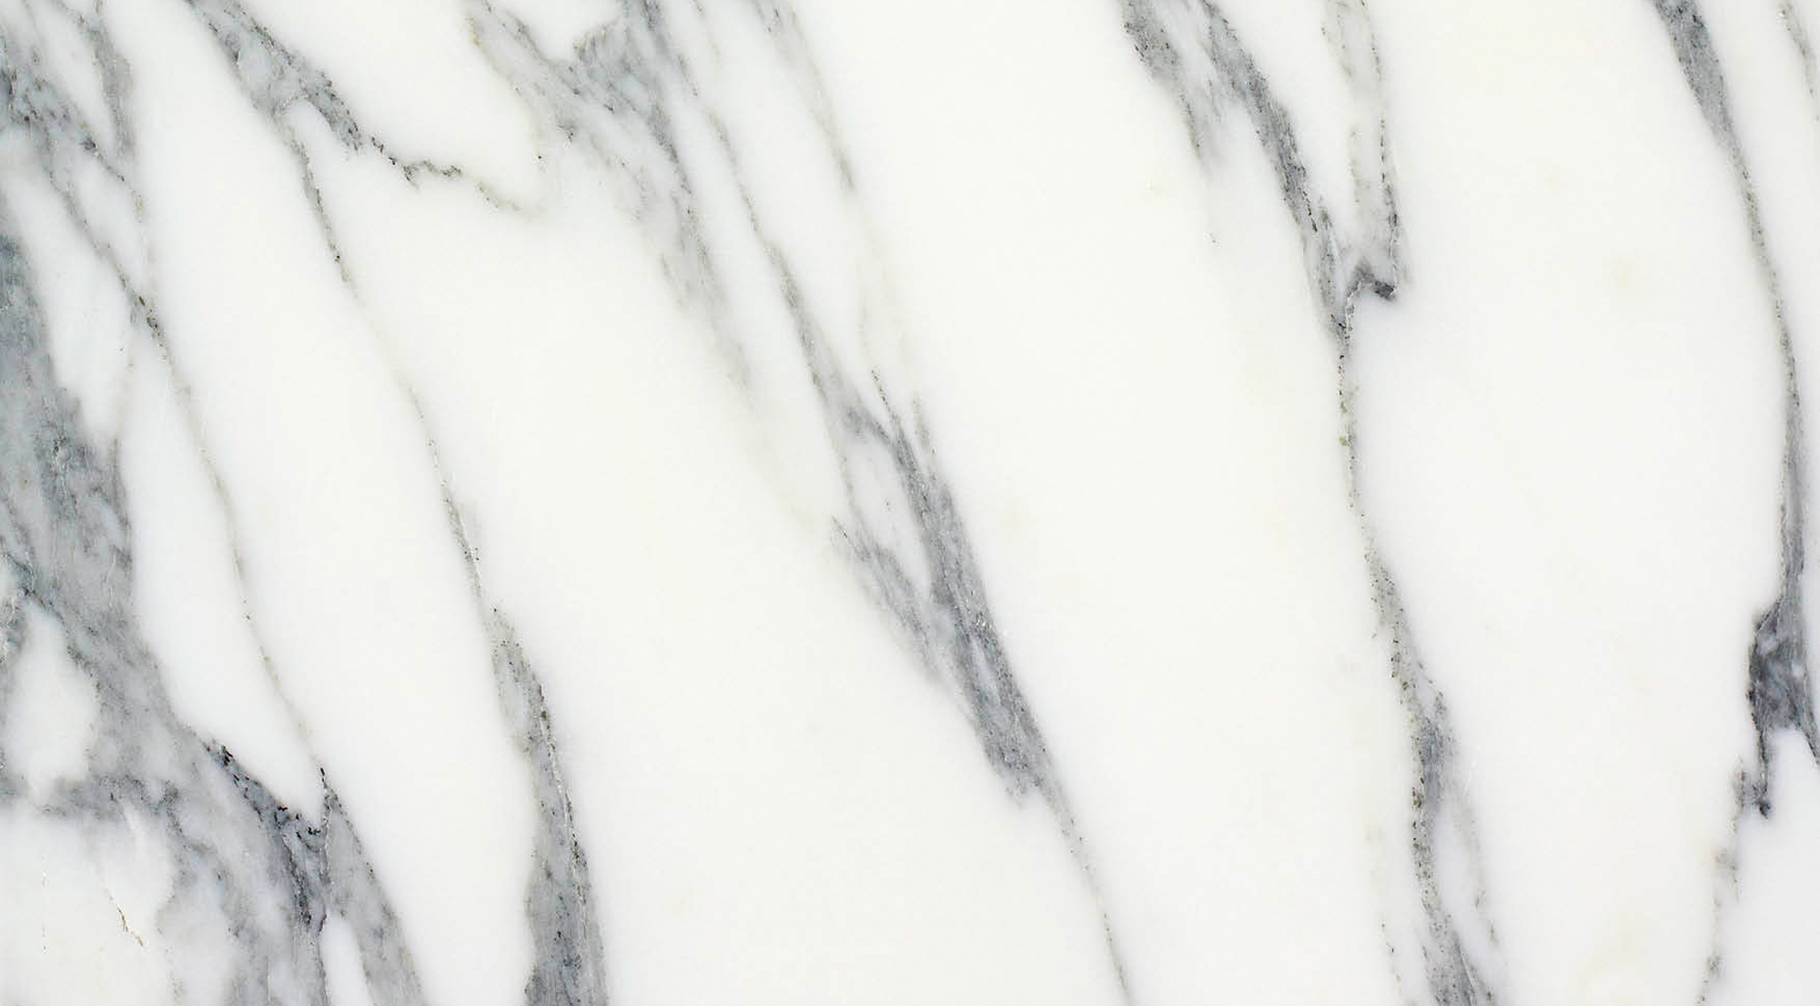 Arabescato Carrara, Italien, Marmor